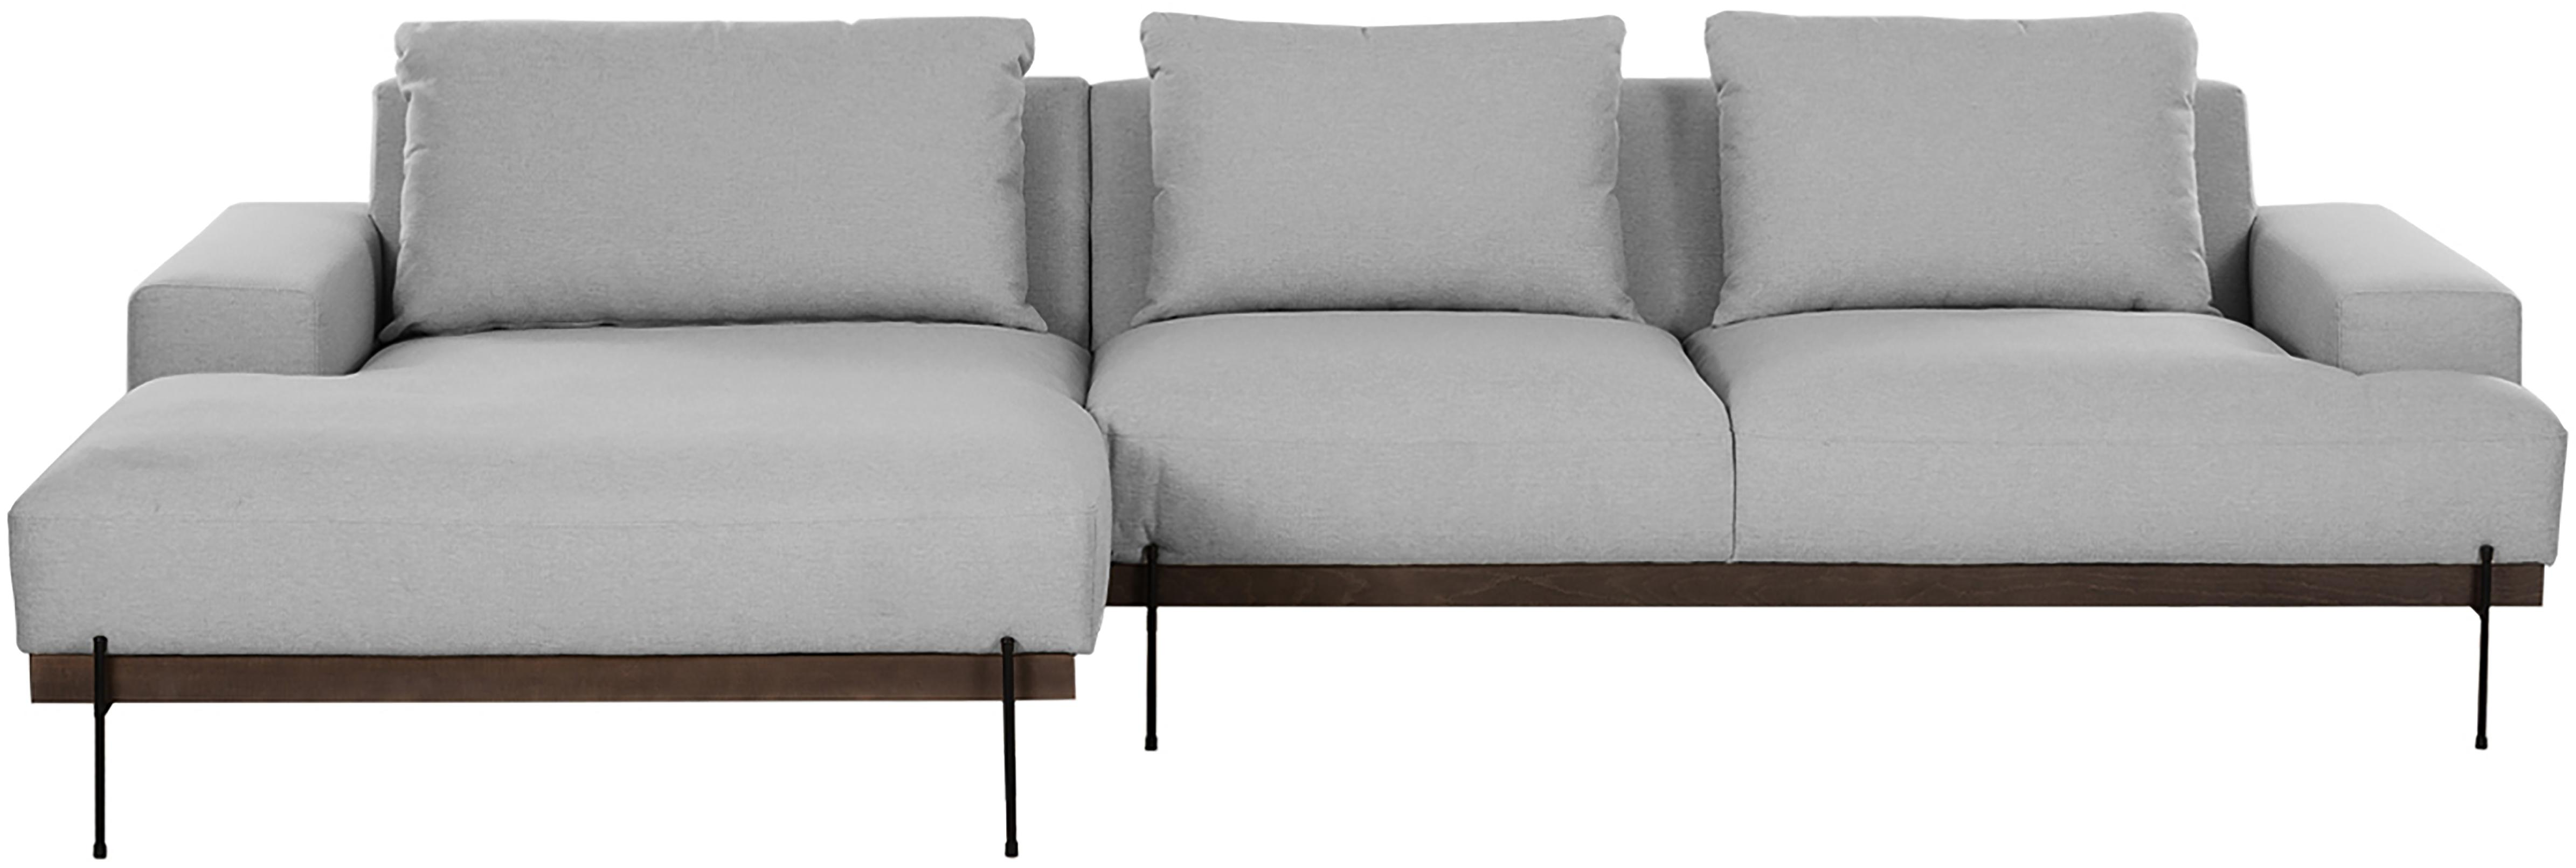 Hoekbank Brooks, Bekleding: polyester, Frame: gelakt grenenhout, Poten: gepoedercoat metaal, Grijs, B 315 x D 148 cm